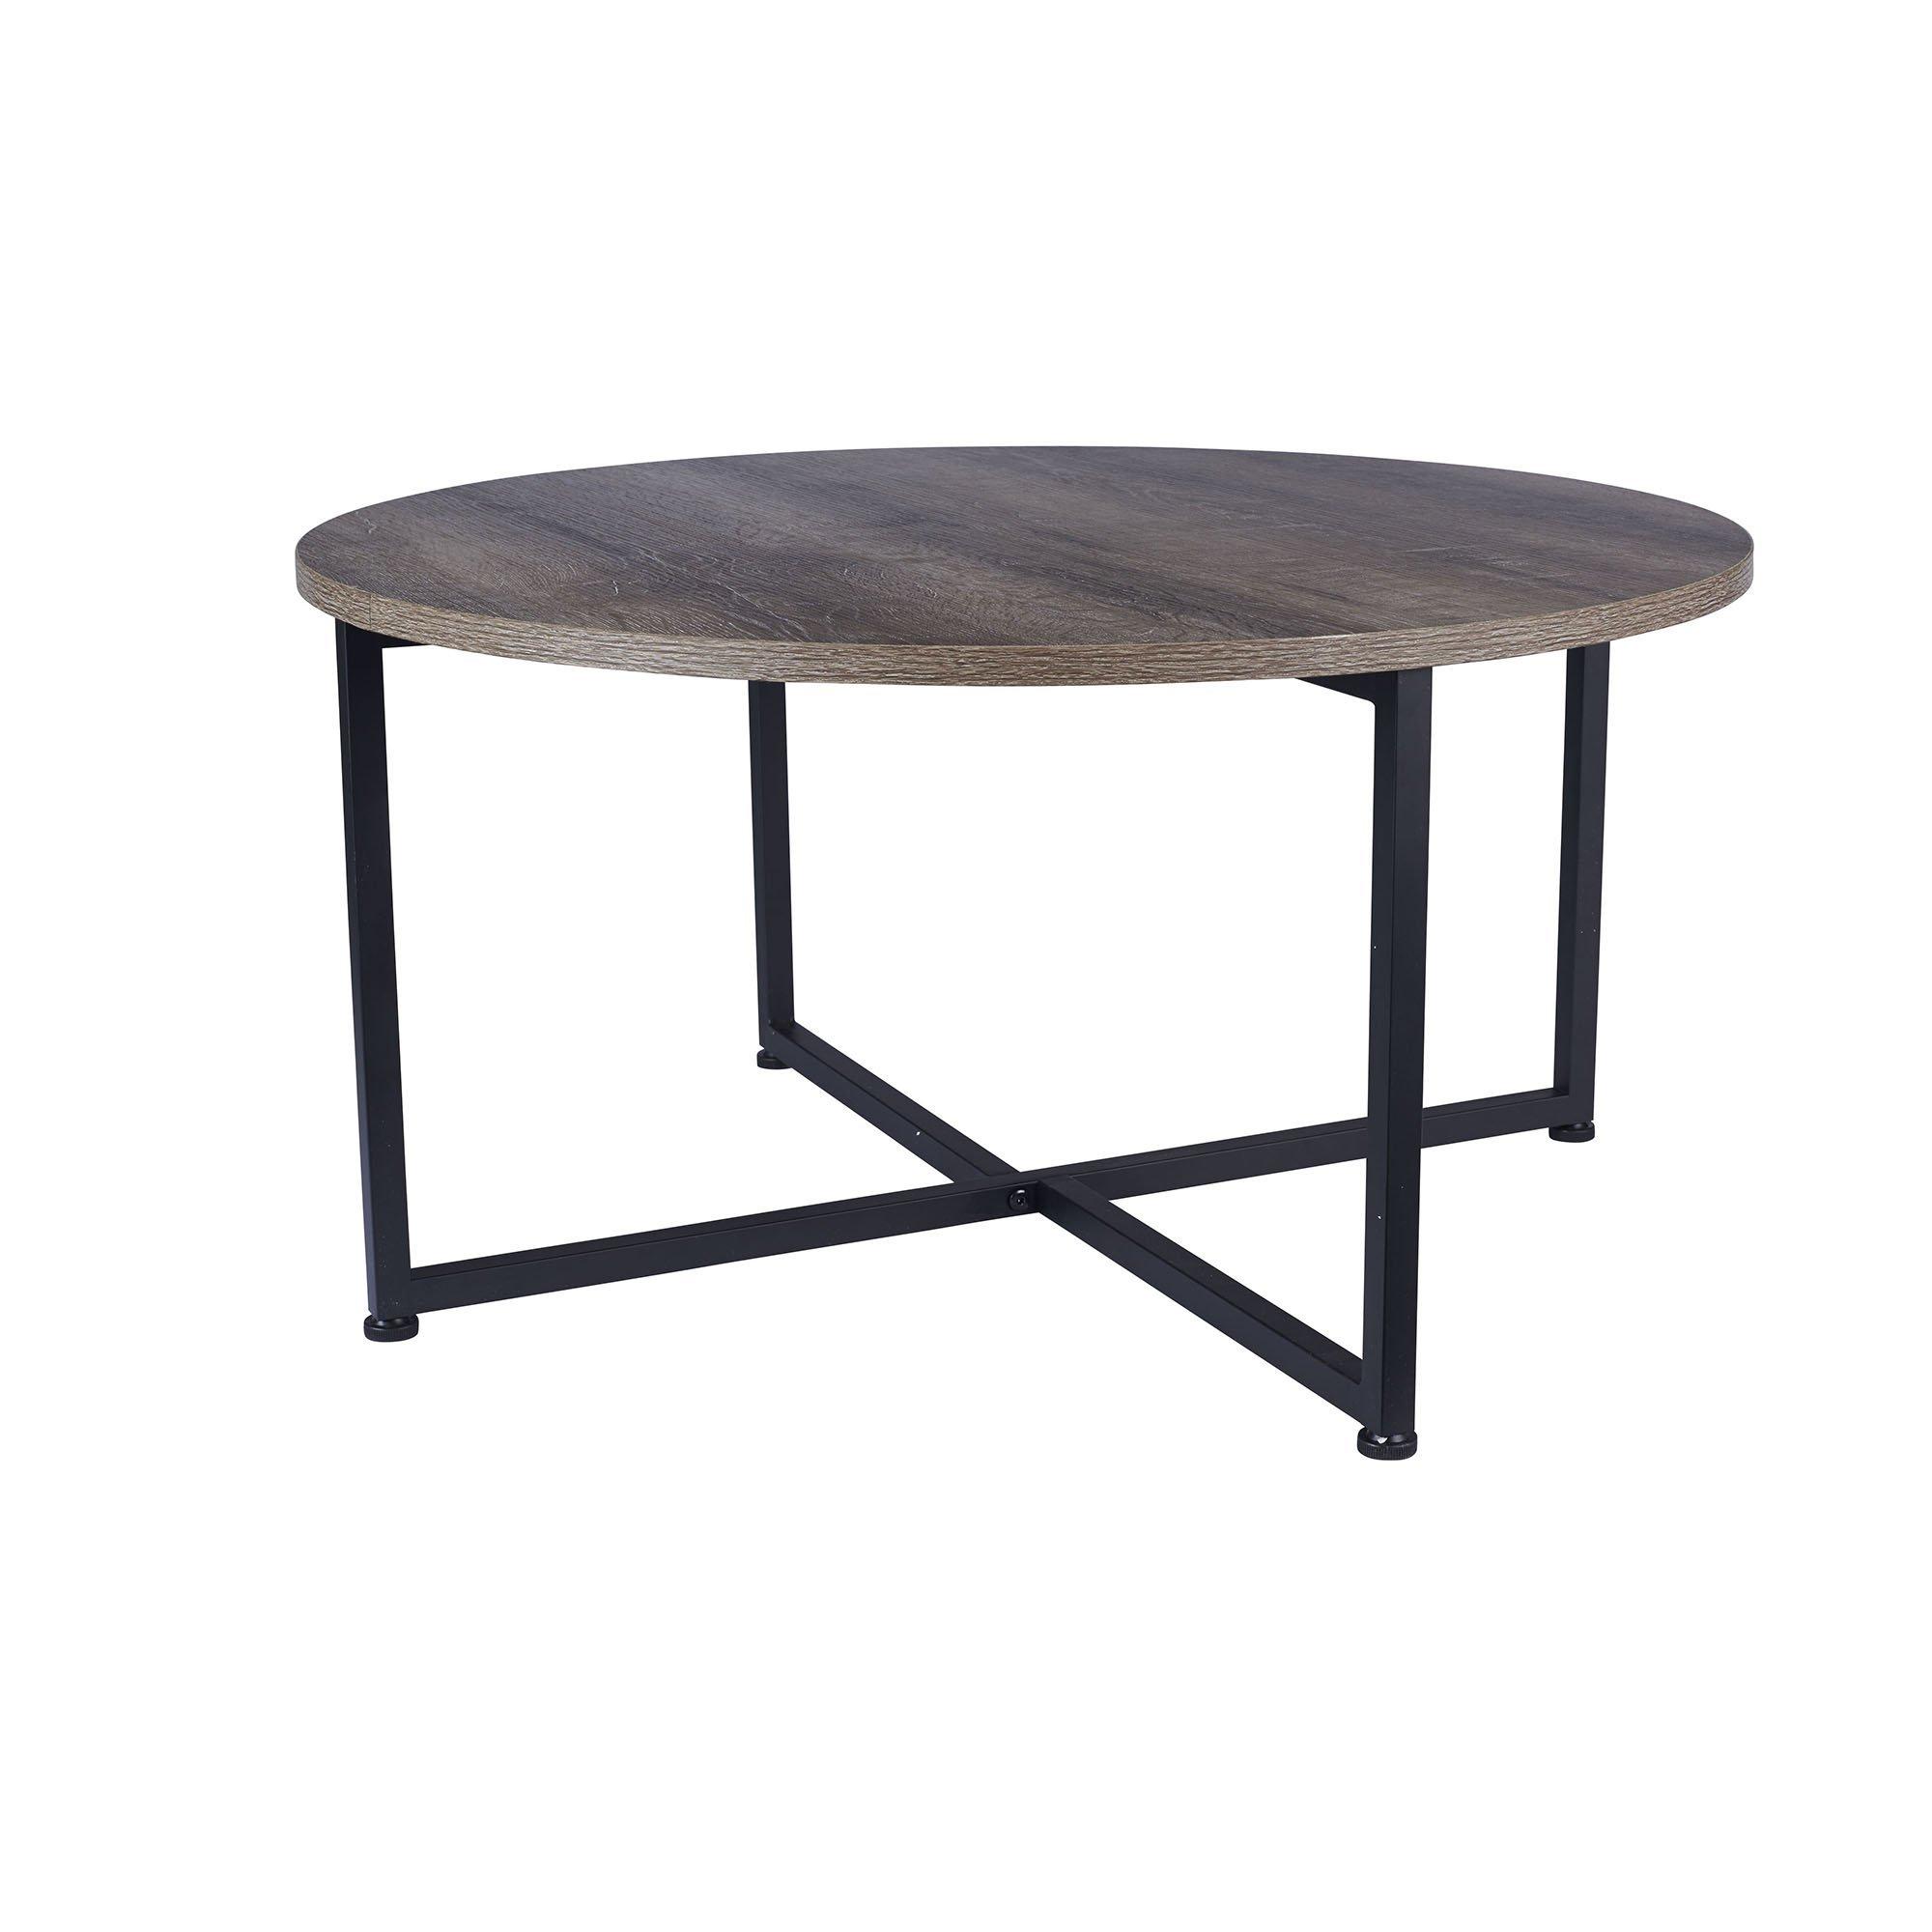 Household Essentials Grey Top Black Frame Ashwood Round Coffee Table by Household Essentials